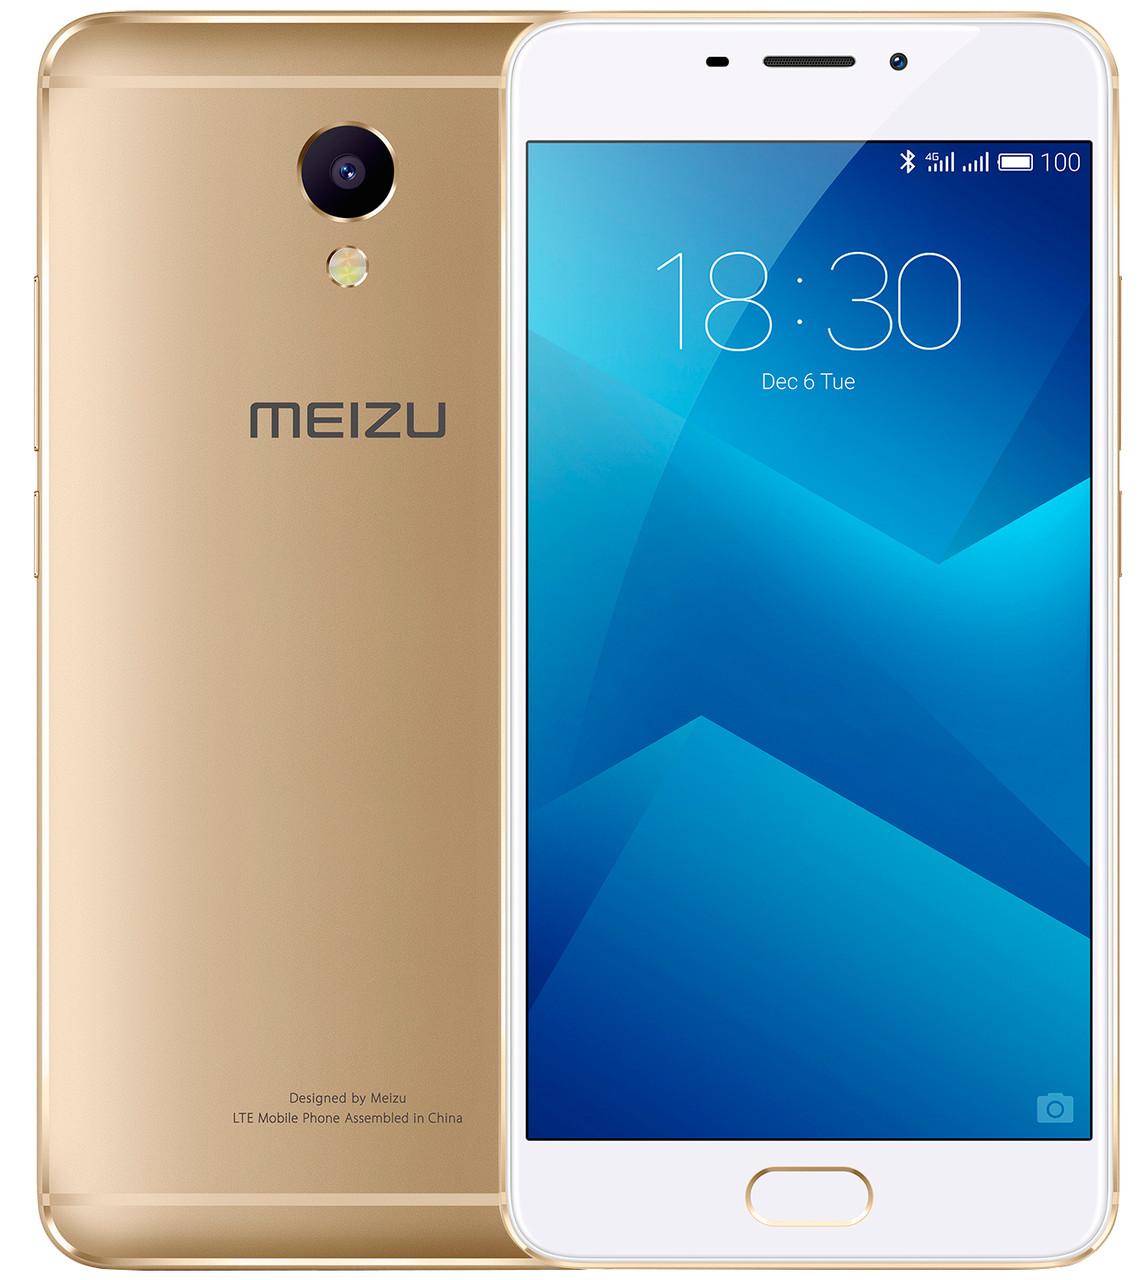 "Смартфон Meizu M5 Note Gold, 3/16Gb, 13/5Мп, 8 ядер, 4000mAh, экран 5.5"" IPS, 2sim, GPS, 4G, Android 6.0"